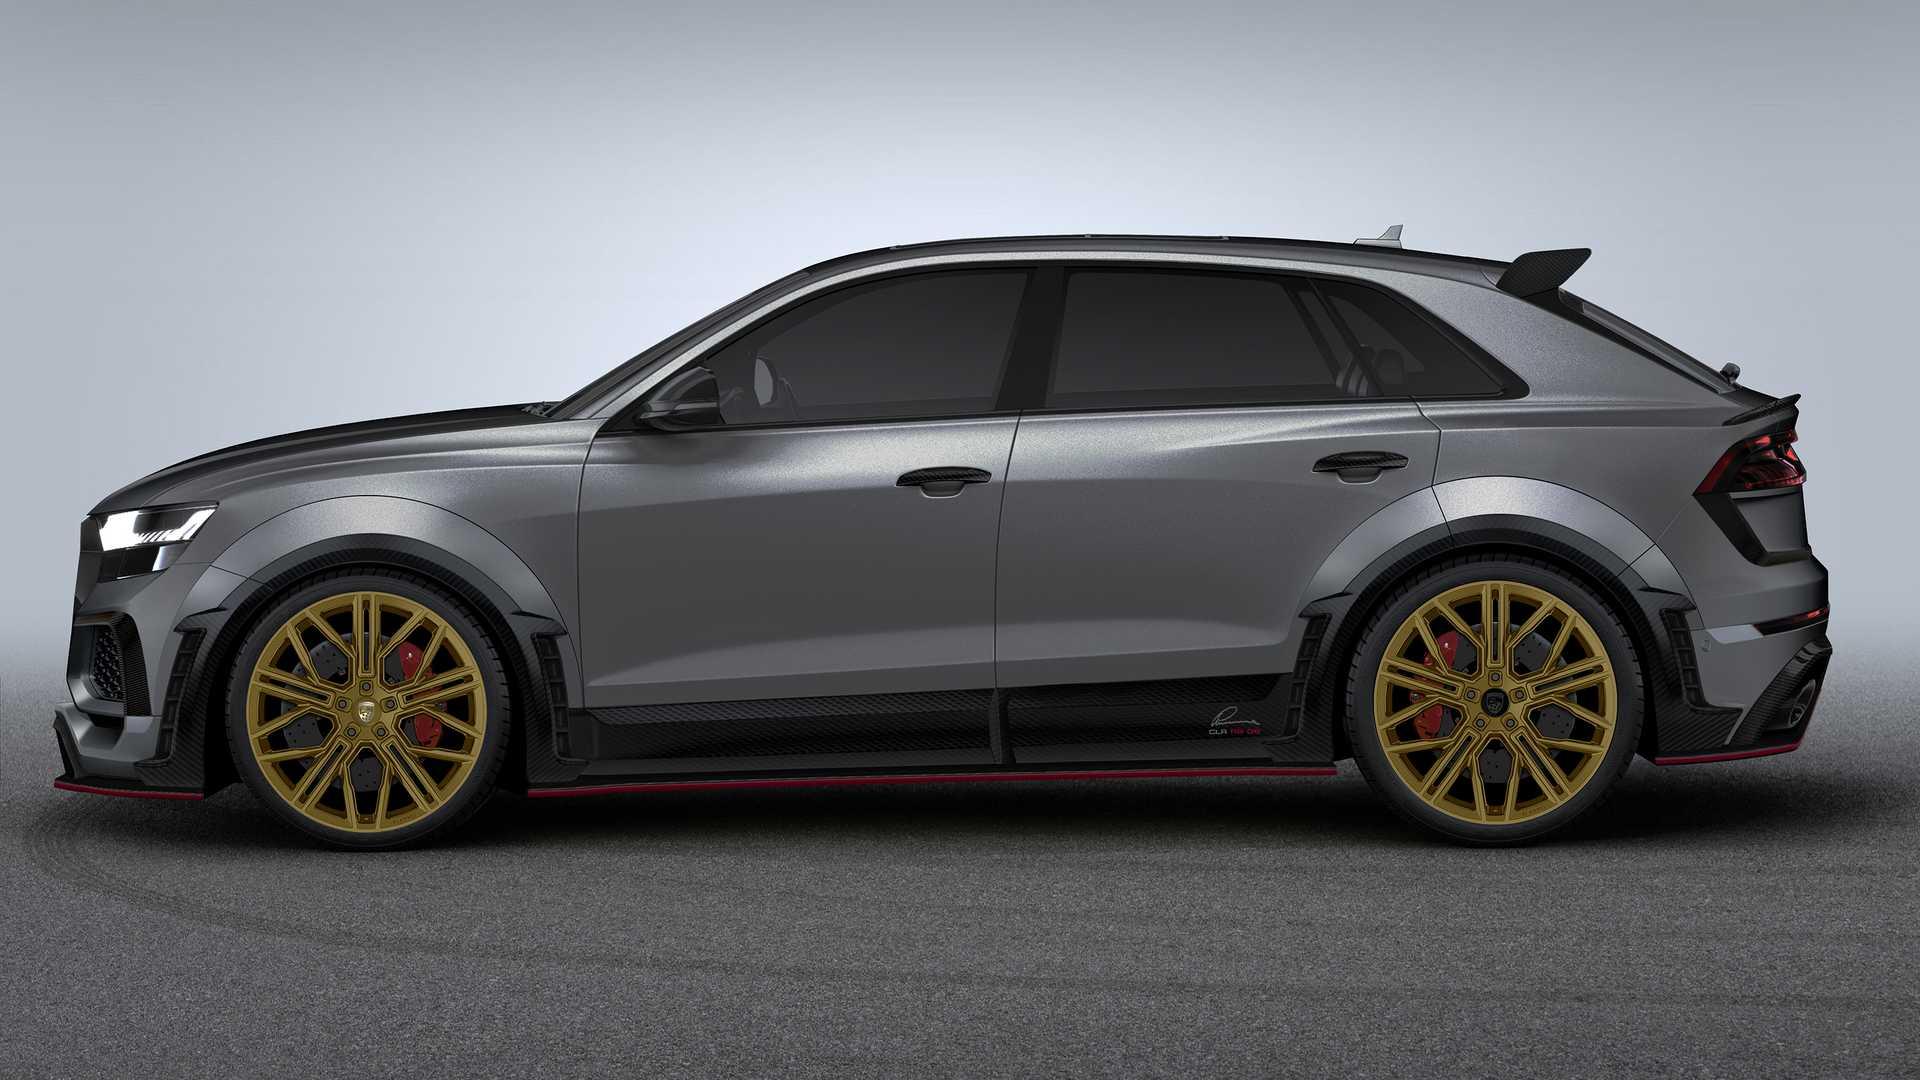 Audi-RS-Q8-CLR-8-RS-By-Lumma-Design-11